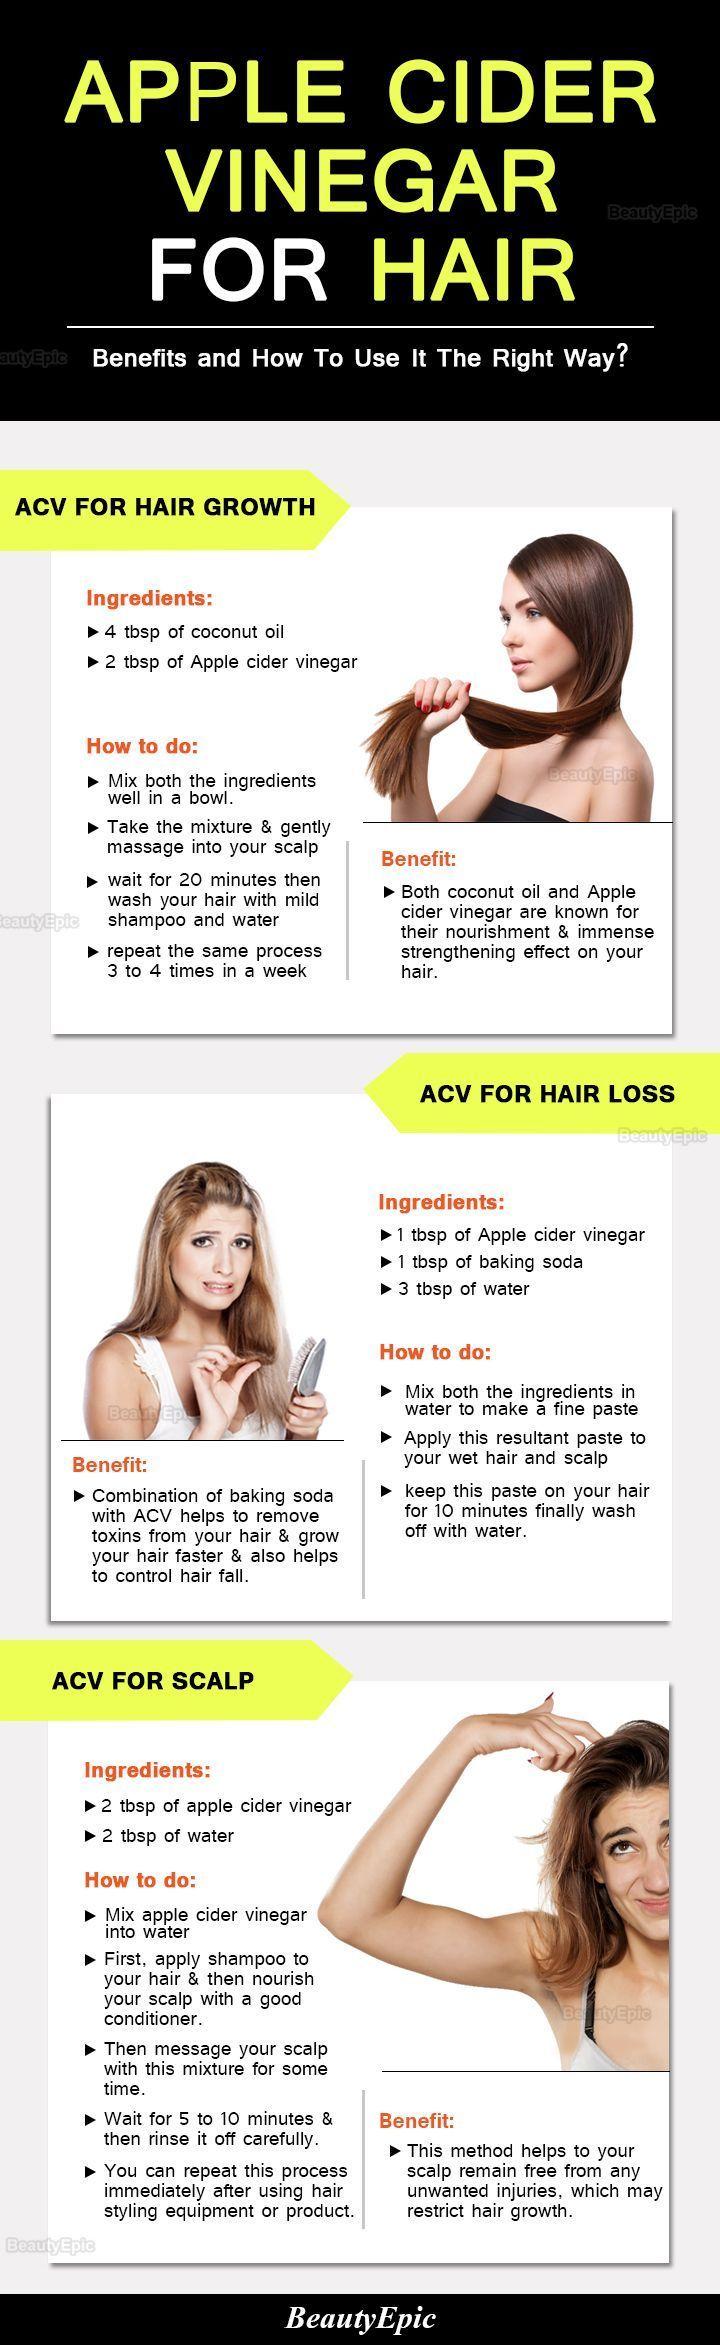 to Use Apple Cider Vinegar for Hair? Apple Cider Vinegar for Hair Benefits and How To Use It The Right WayApple Cider Vinegar for Hair Benefits and How To Use It The Right Way